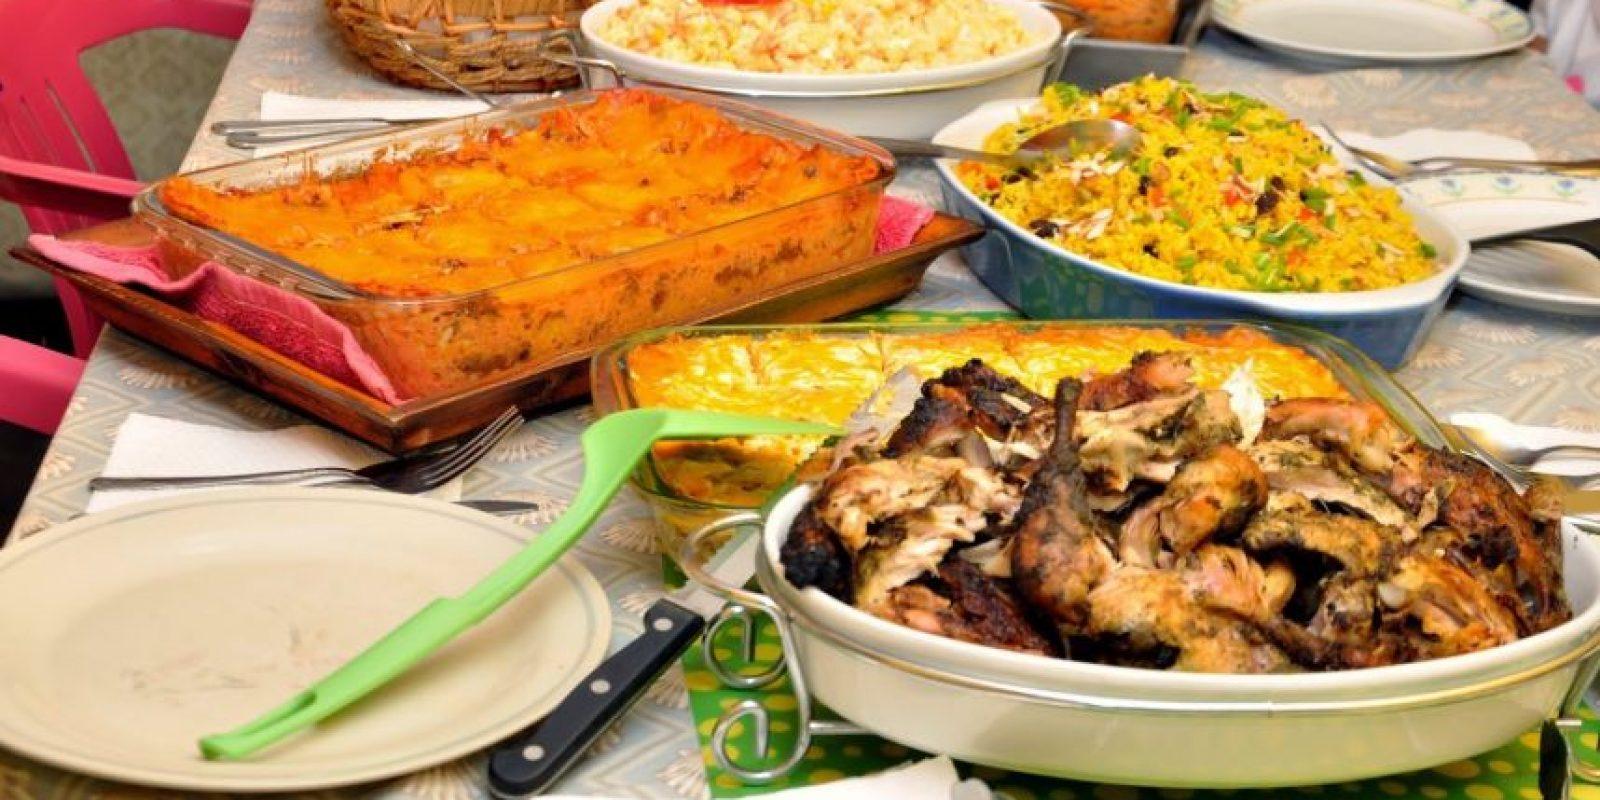 Este jueves la familia se reúne alrededor de la cena navideña